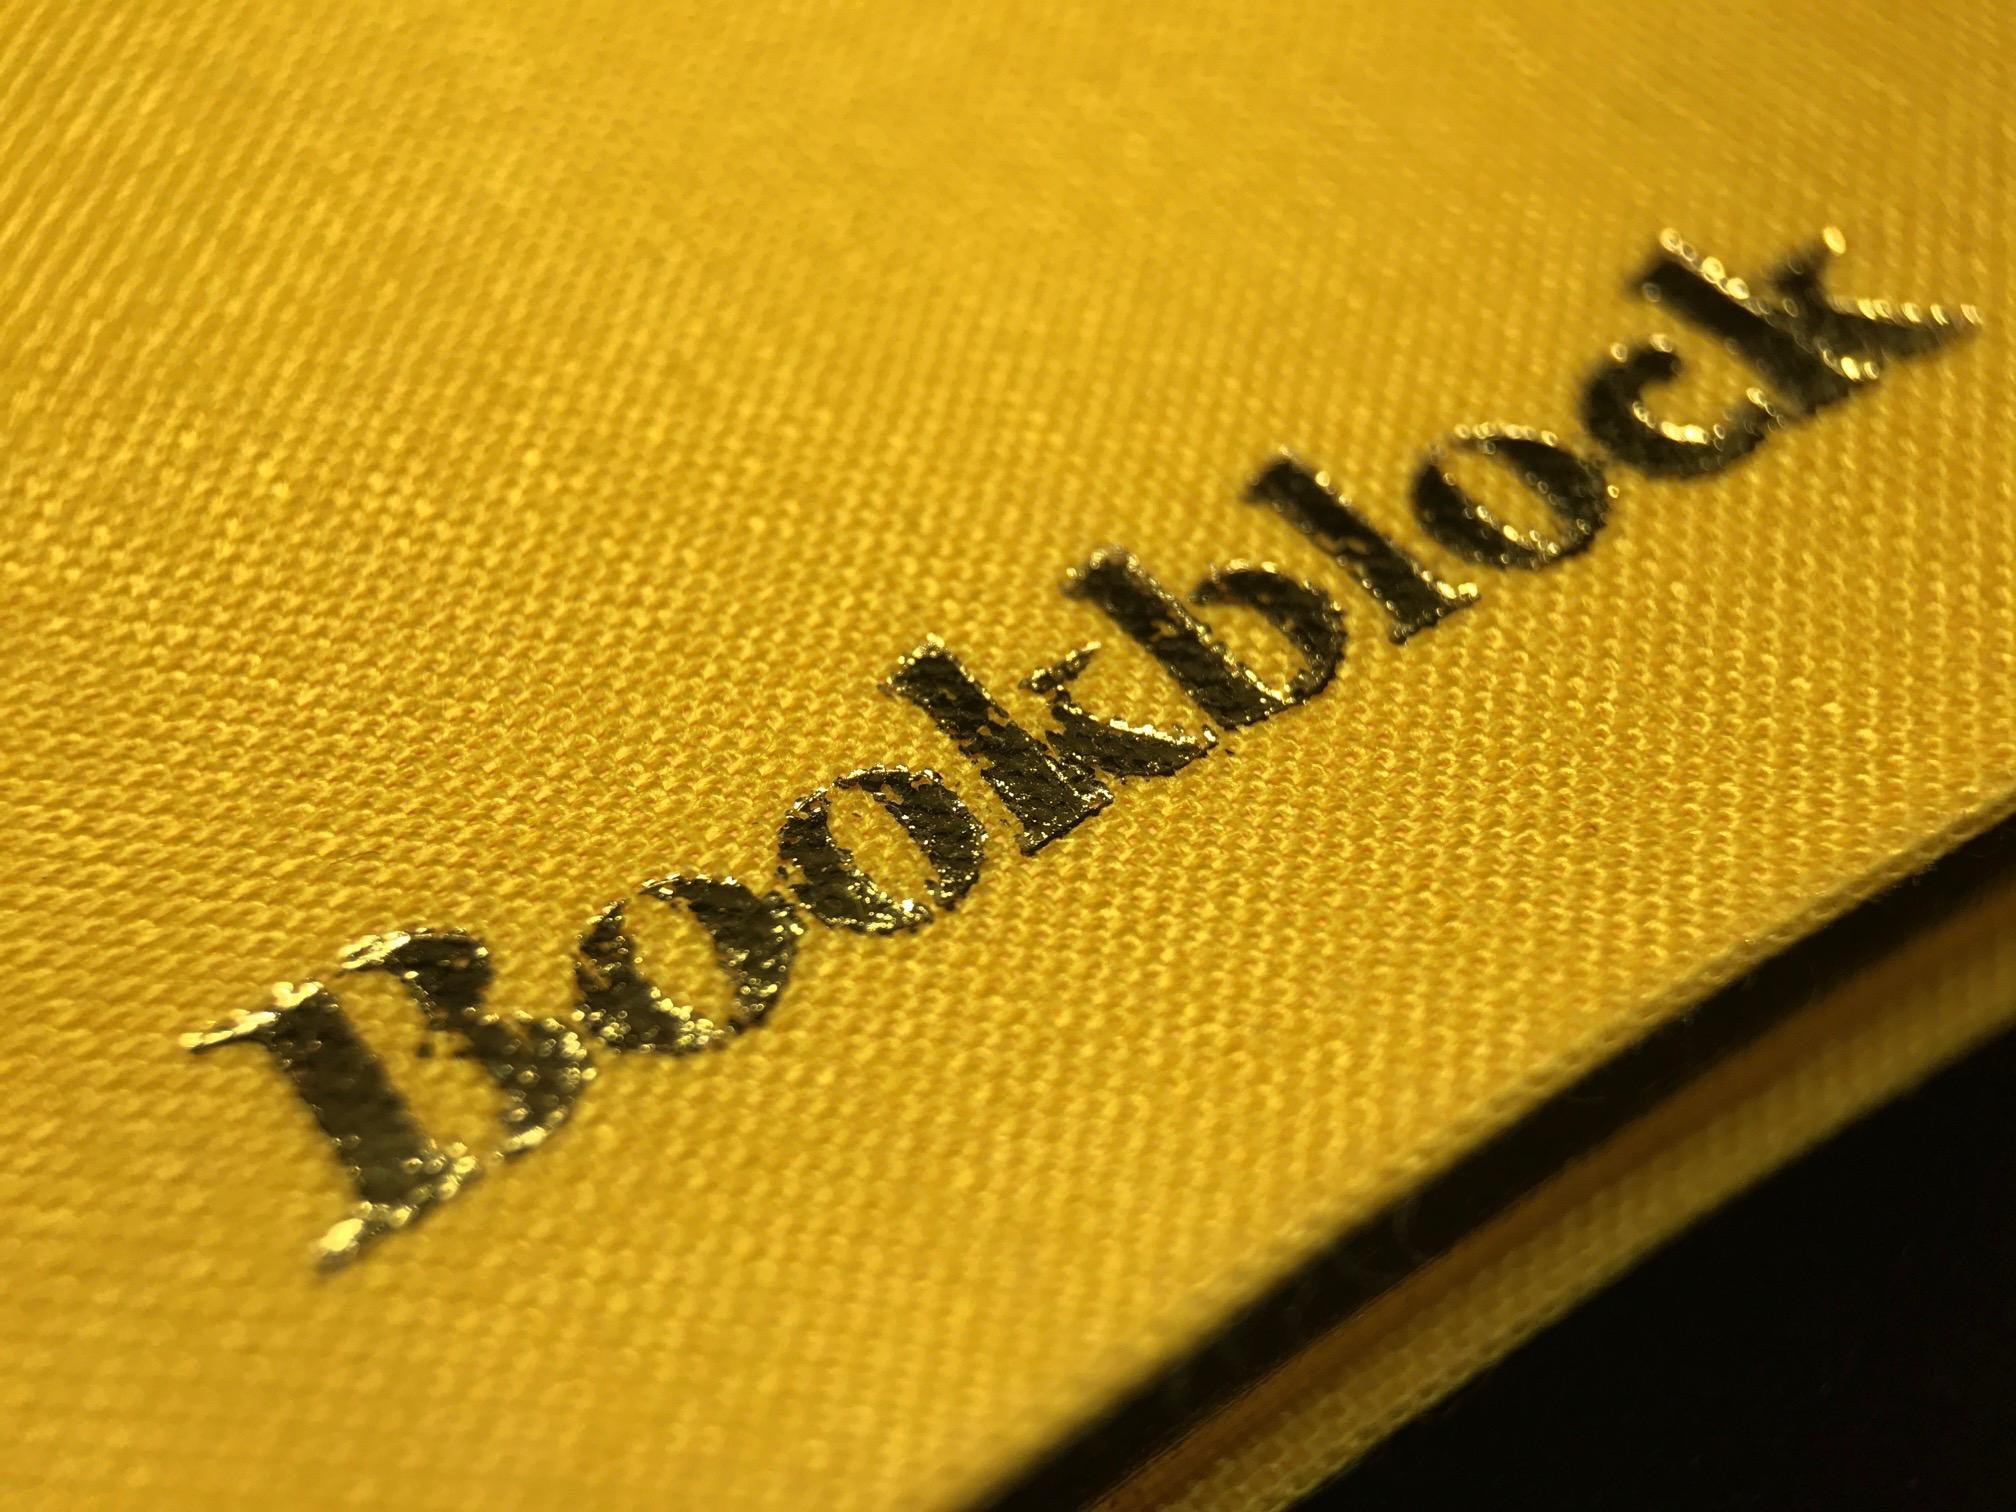 weskin-bookblock-notebook-12.jpg